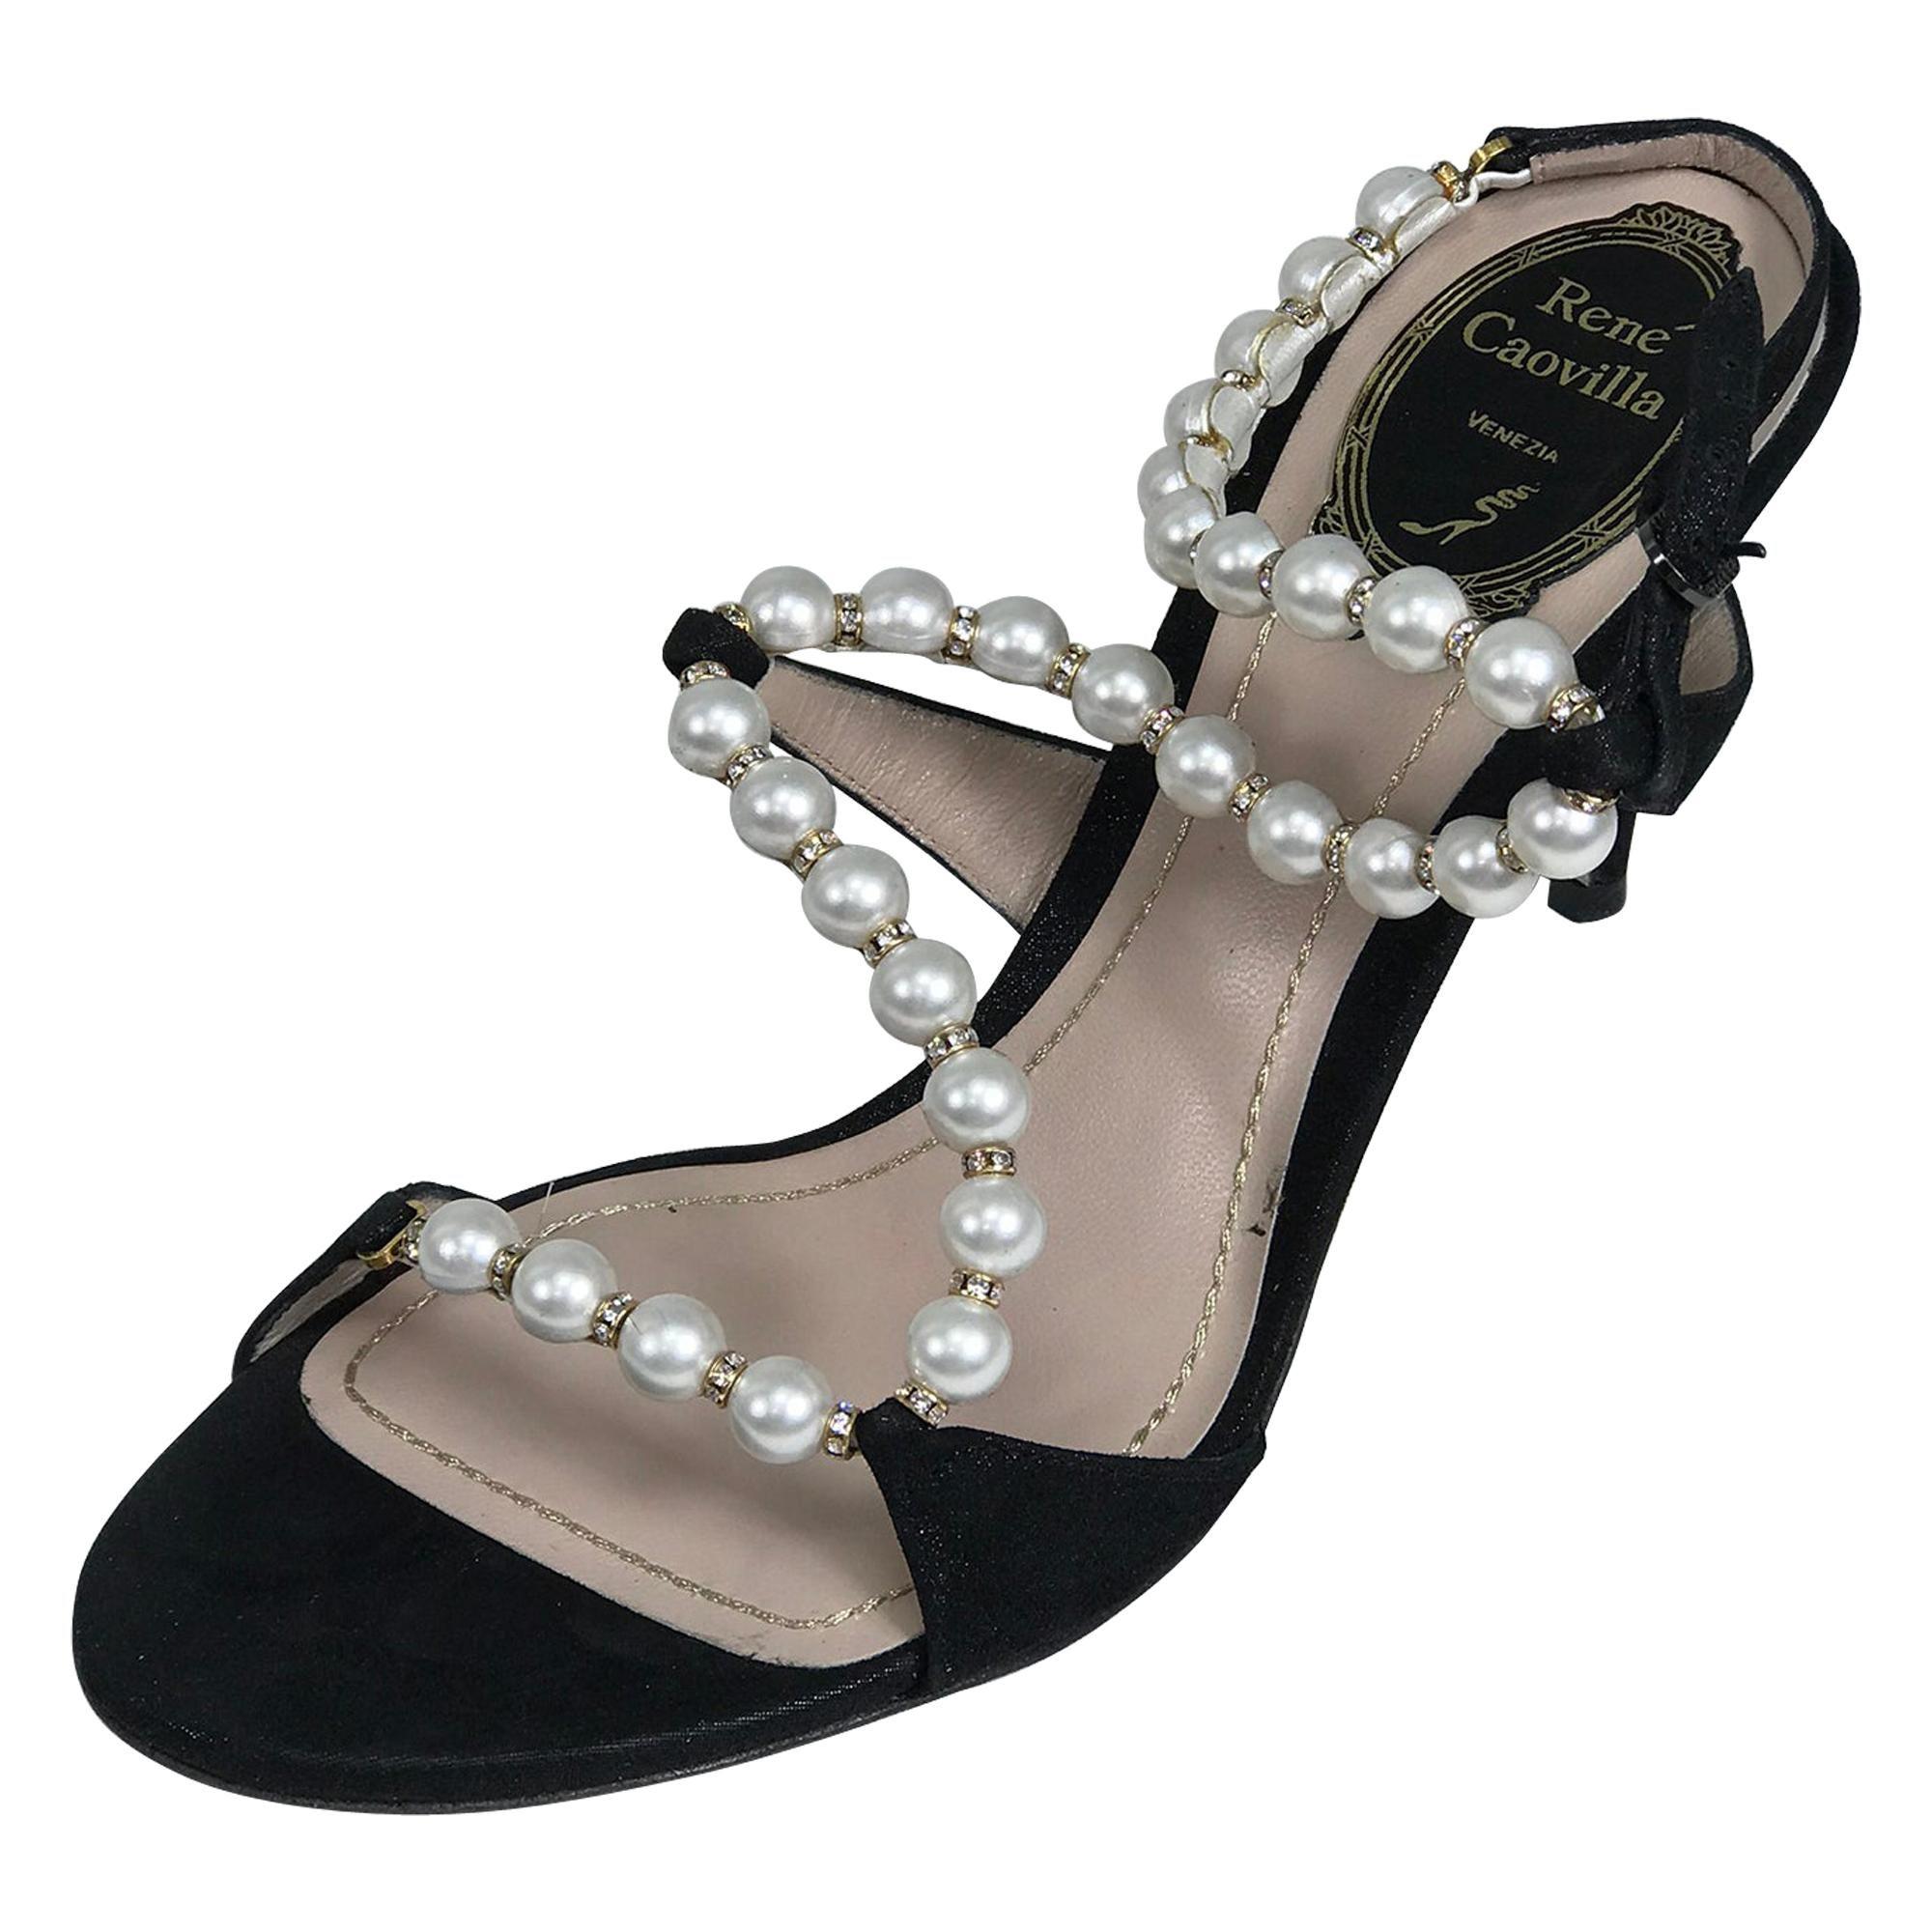 Rene Caovilla Black Wendy Pearl Rhinestone Suede Ankle Strap High Heels 36 1/2